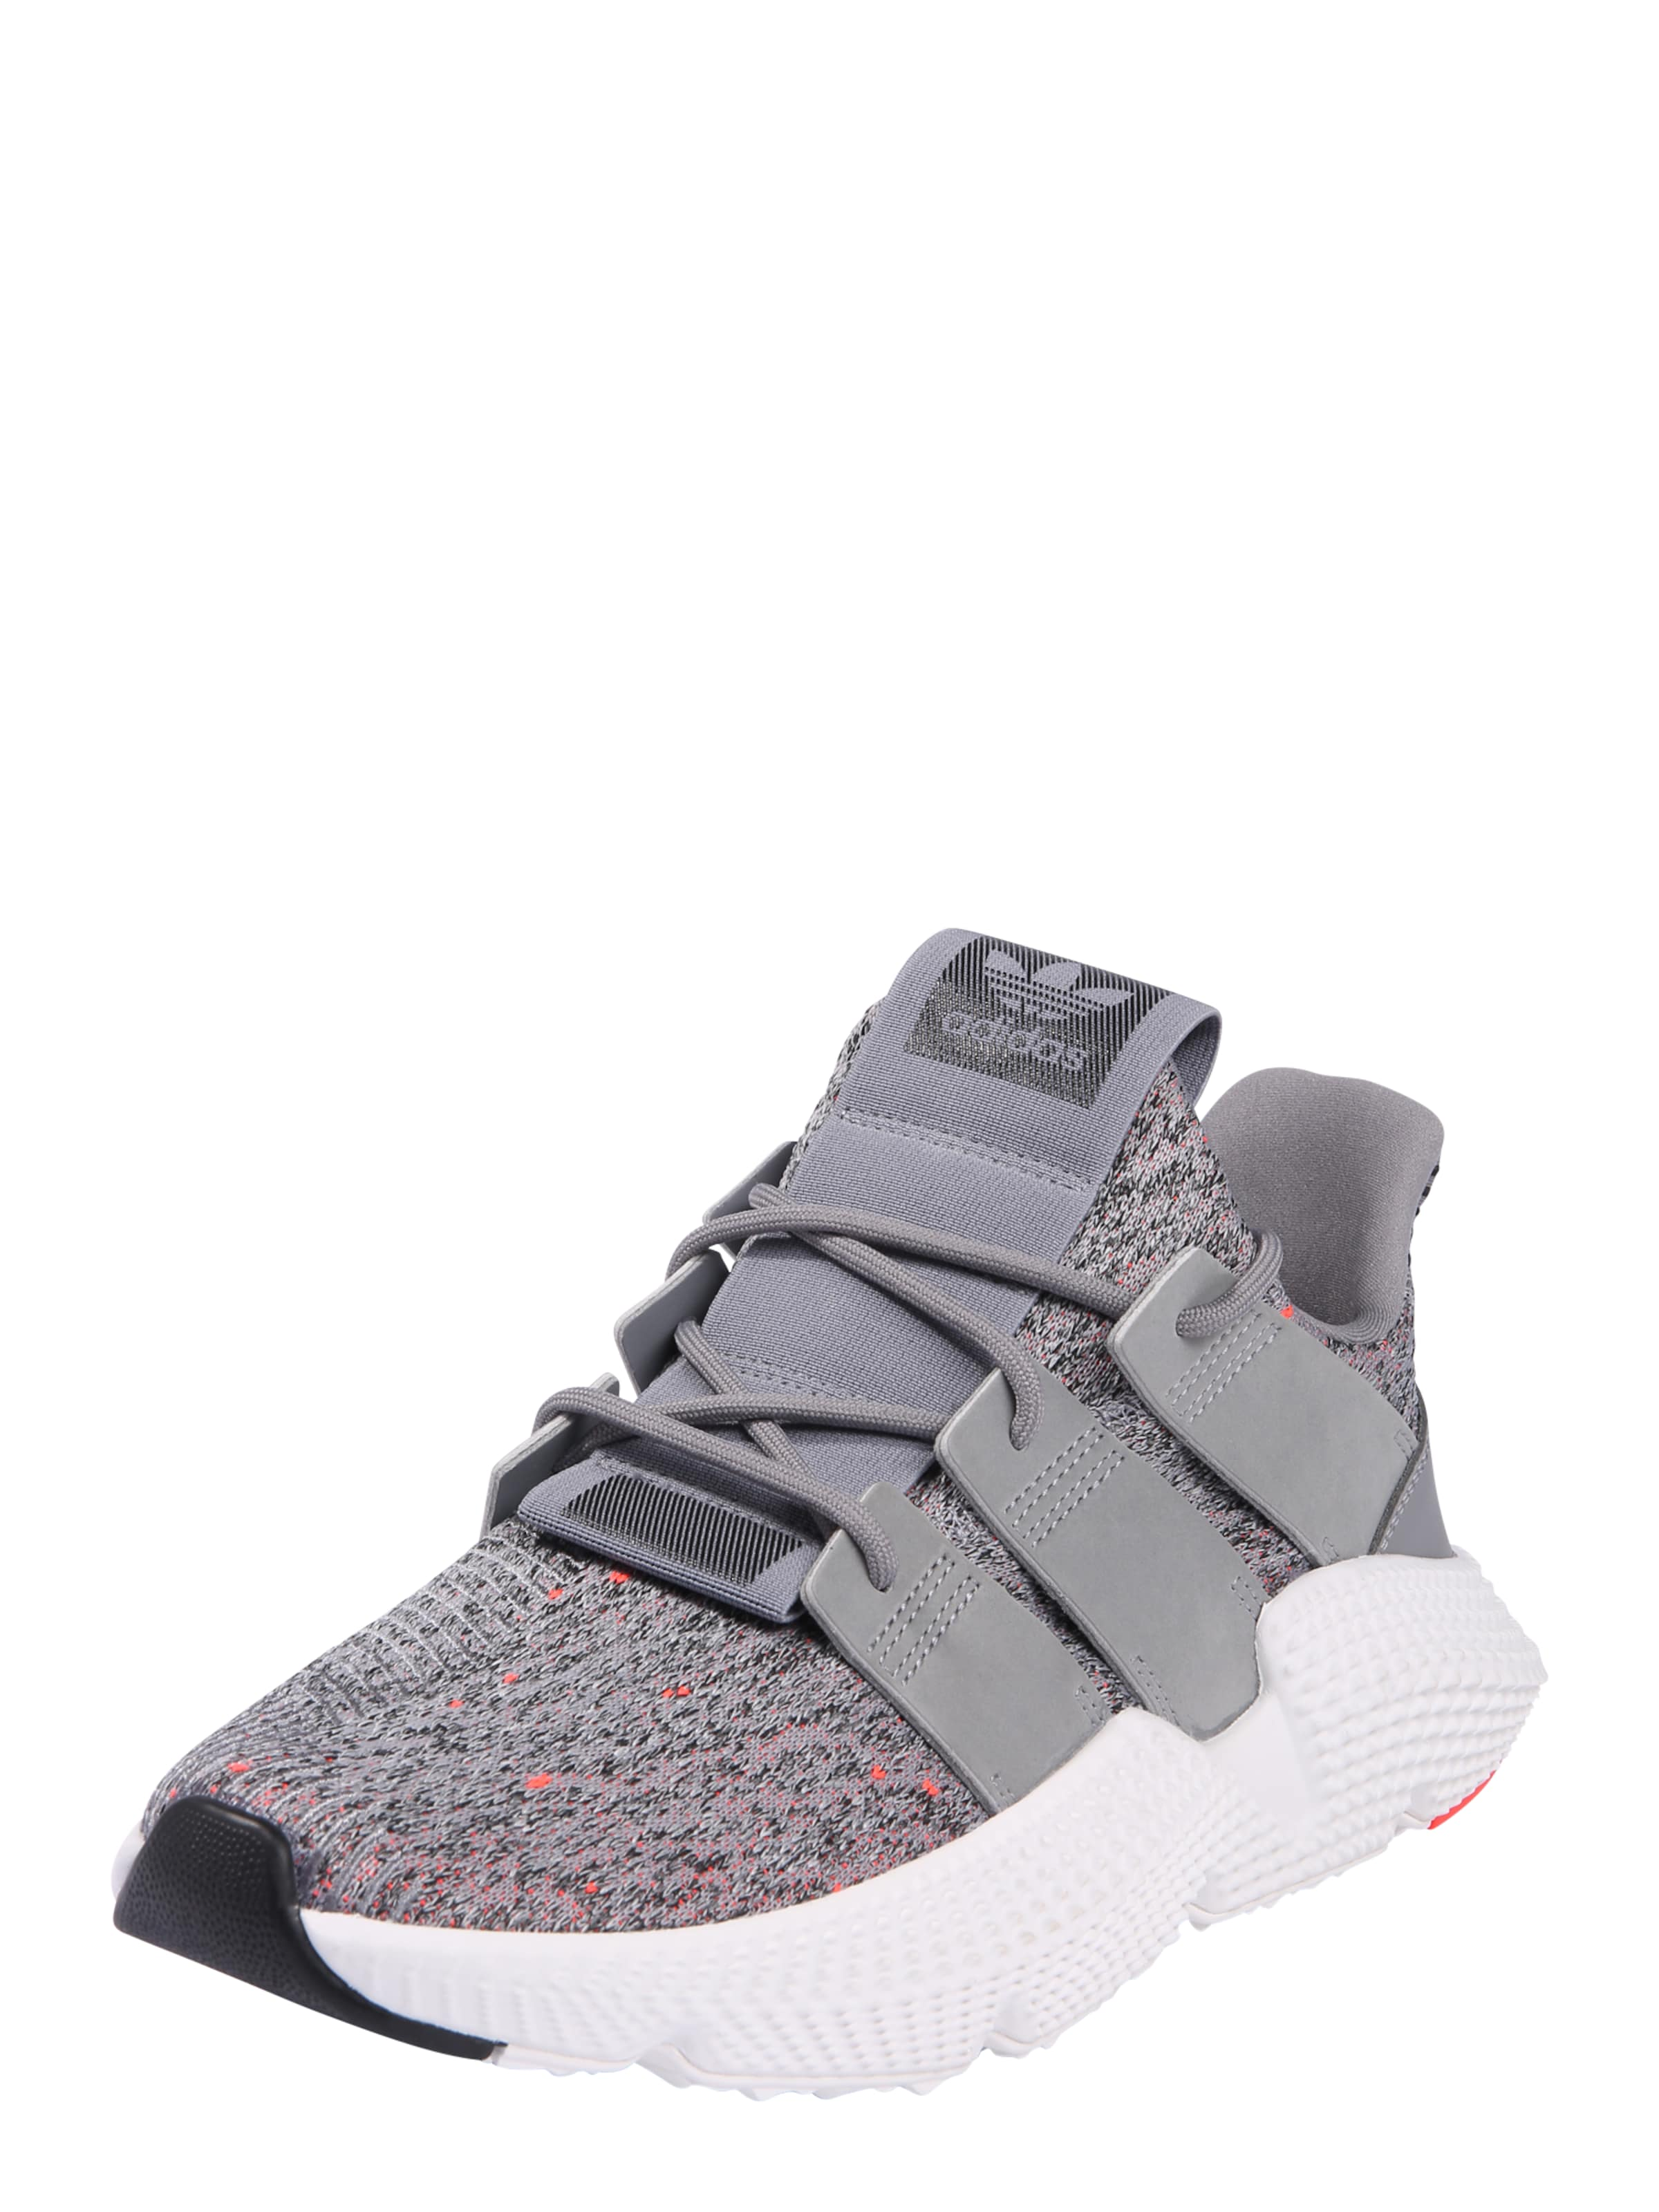 ADIDAS ORIGINALS Sneaker PROPHERE Verschleißfeste billige Schuhe